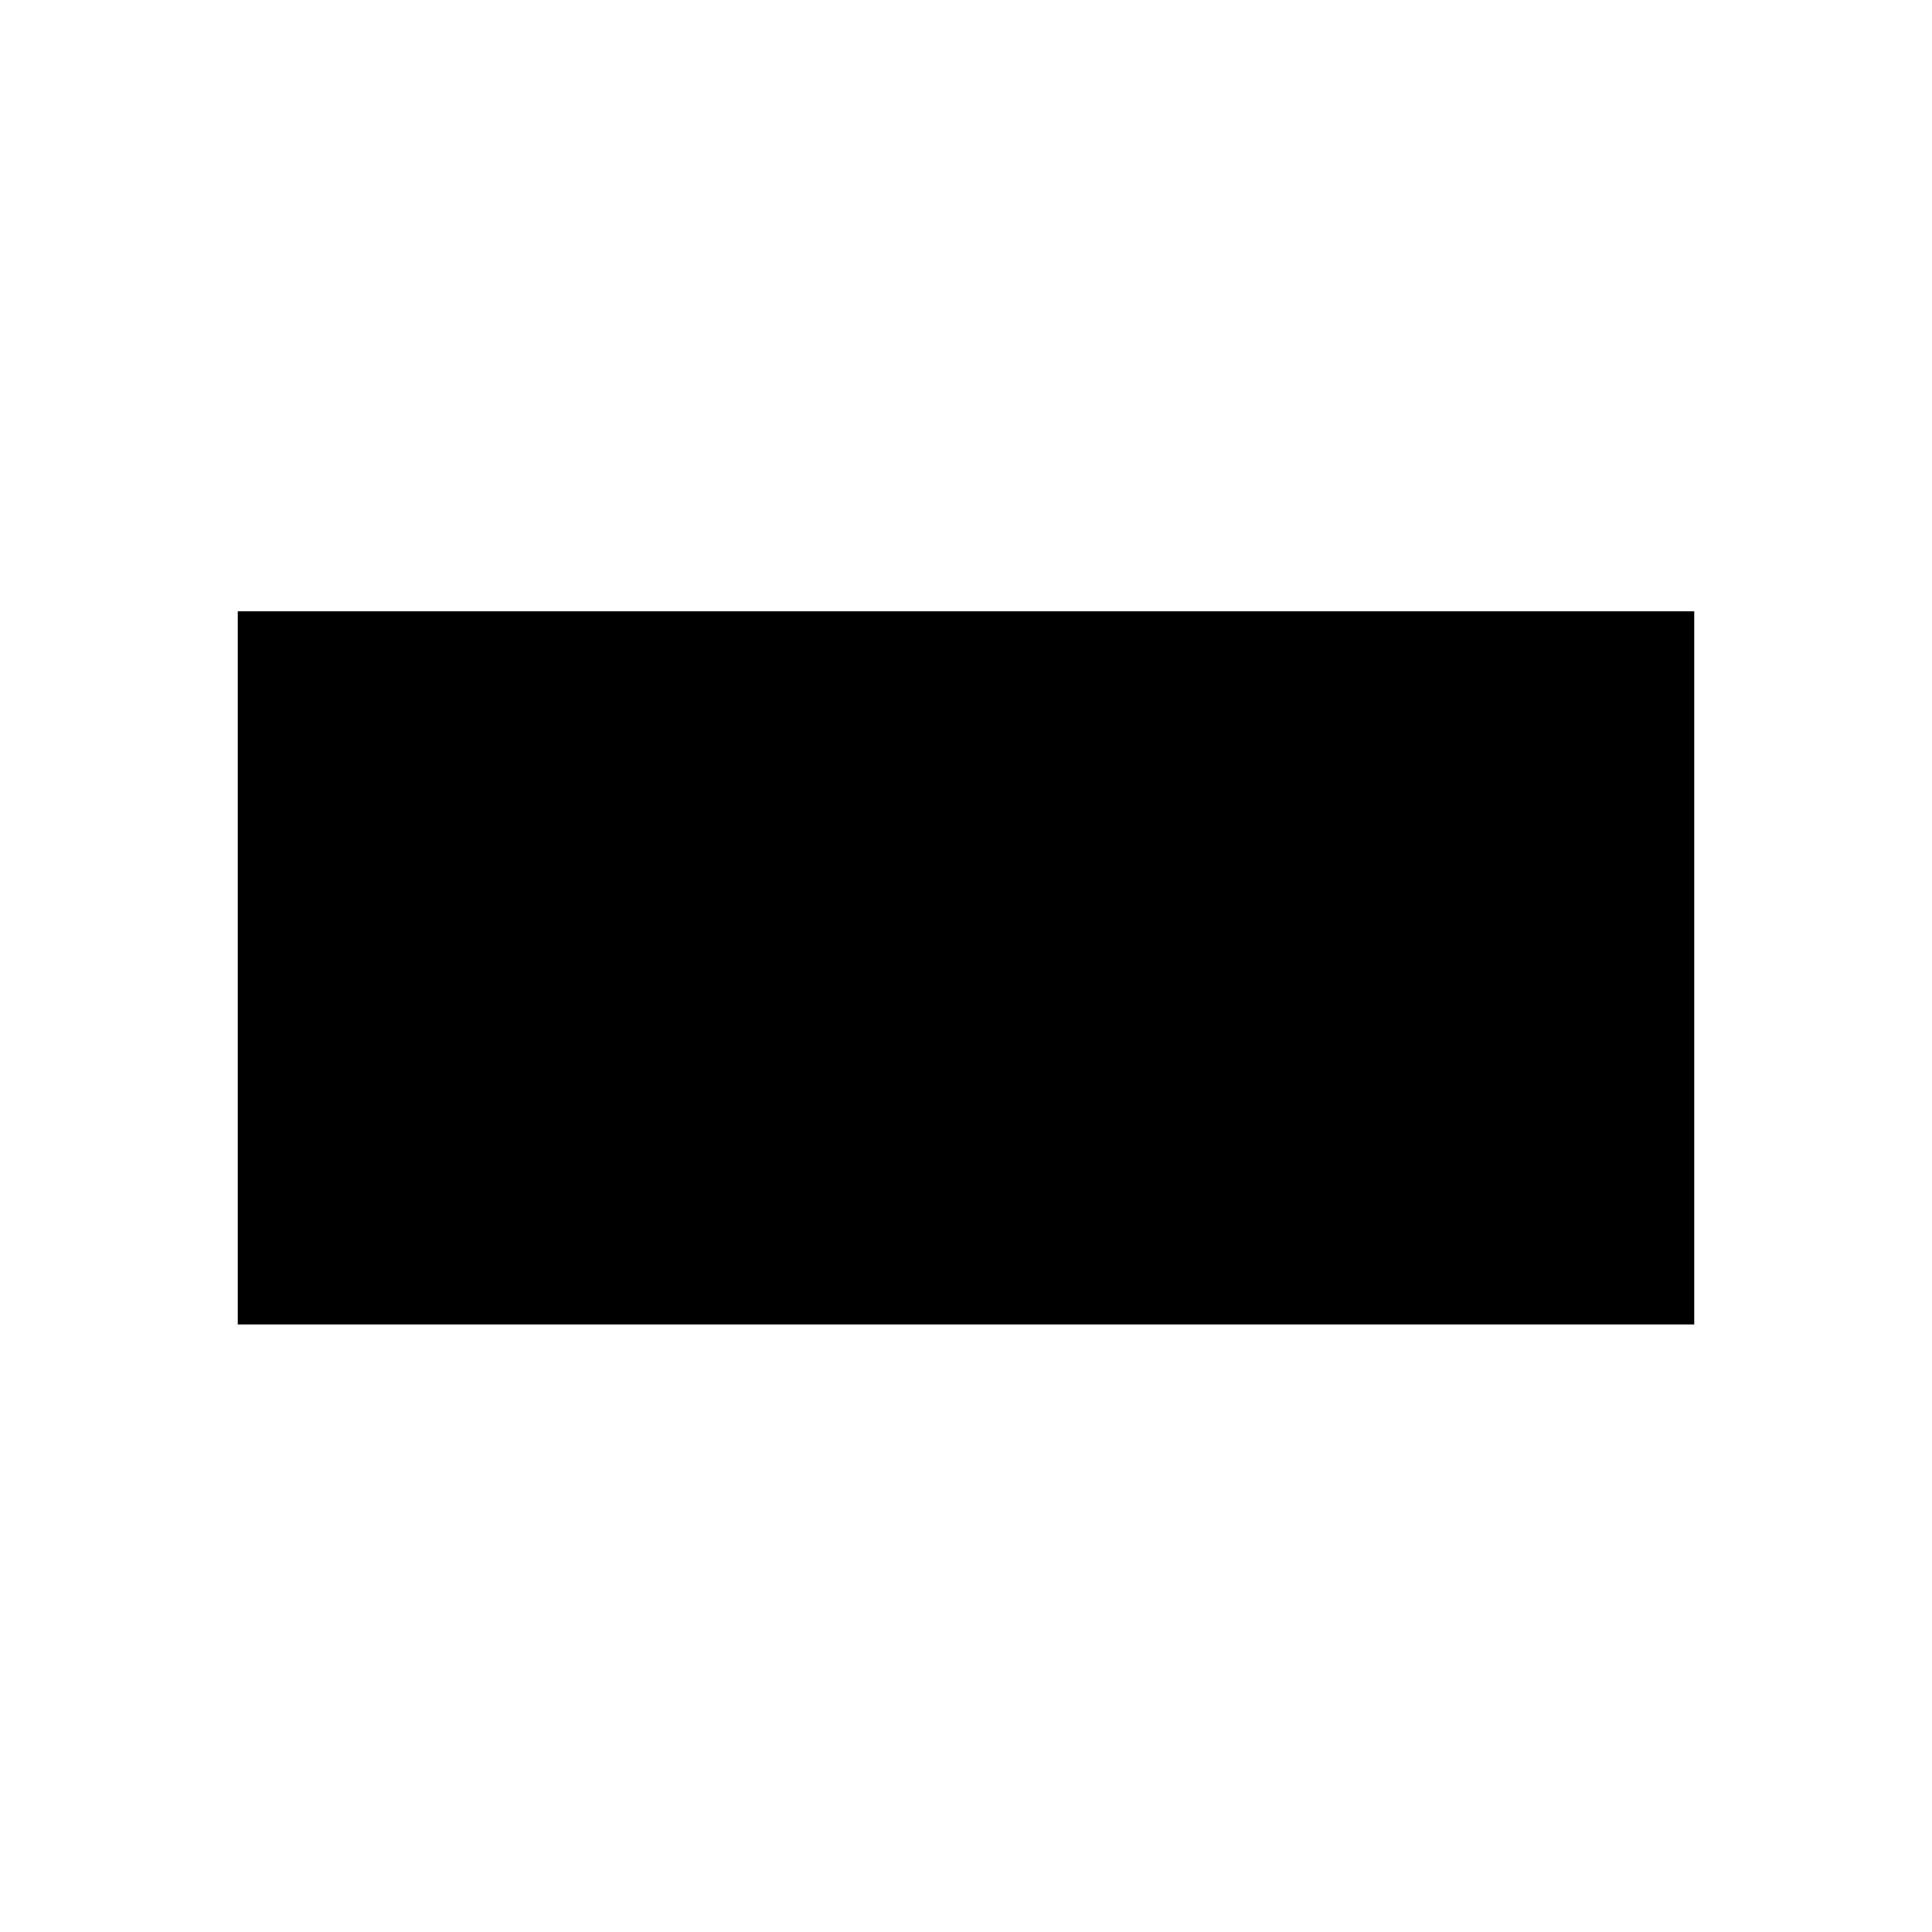 onitsuka tiger mexico 66 black on black 4sha